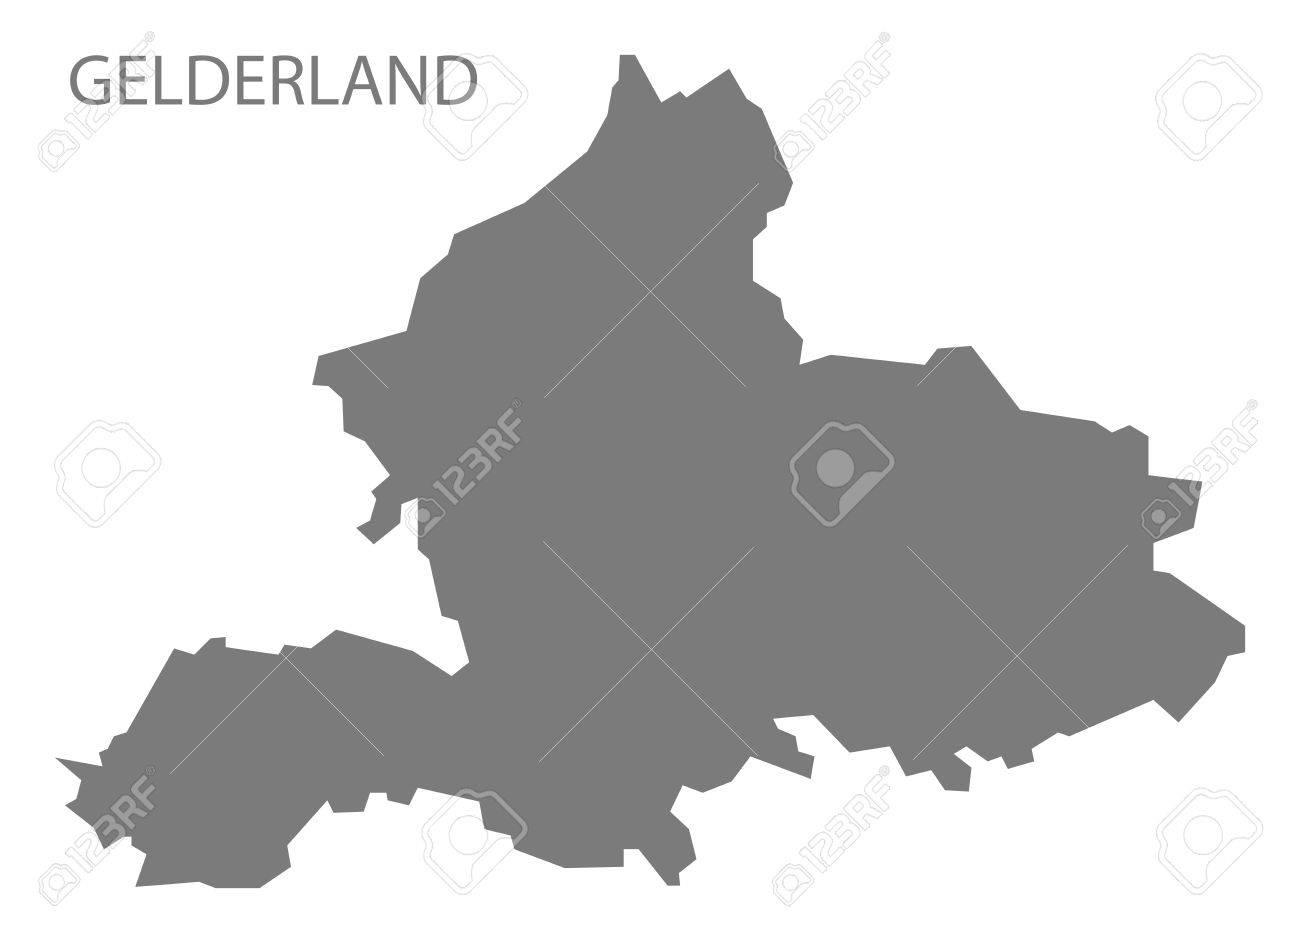 Gelderland Netherlands Map In Grey Royalty Free Cliparts Vectors